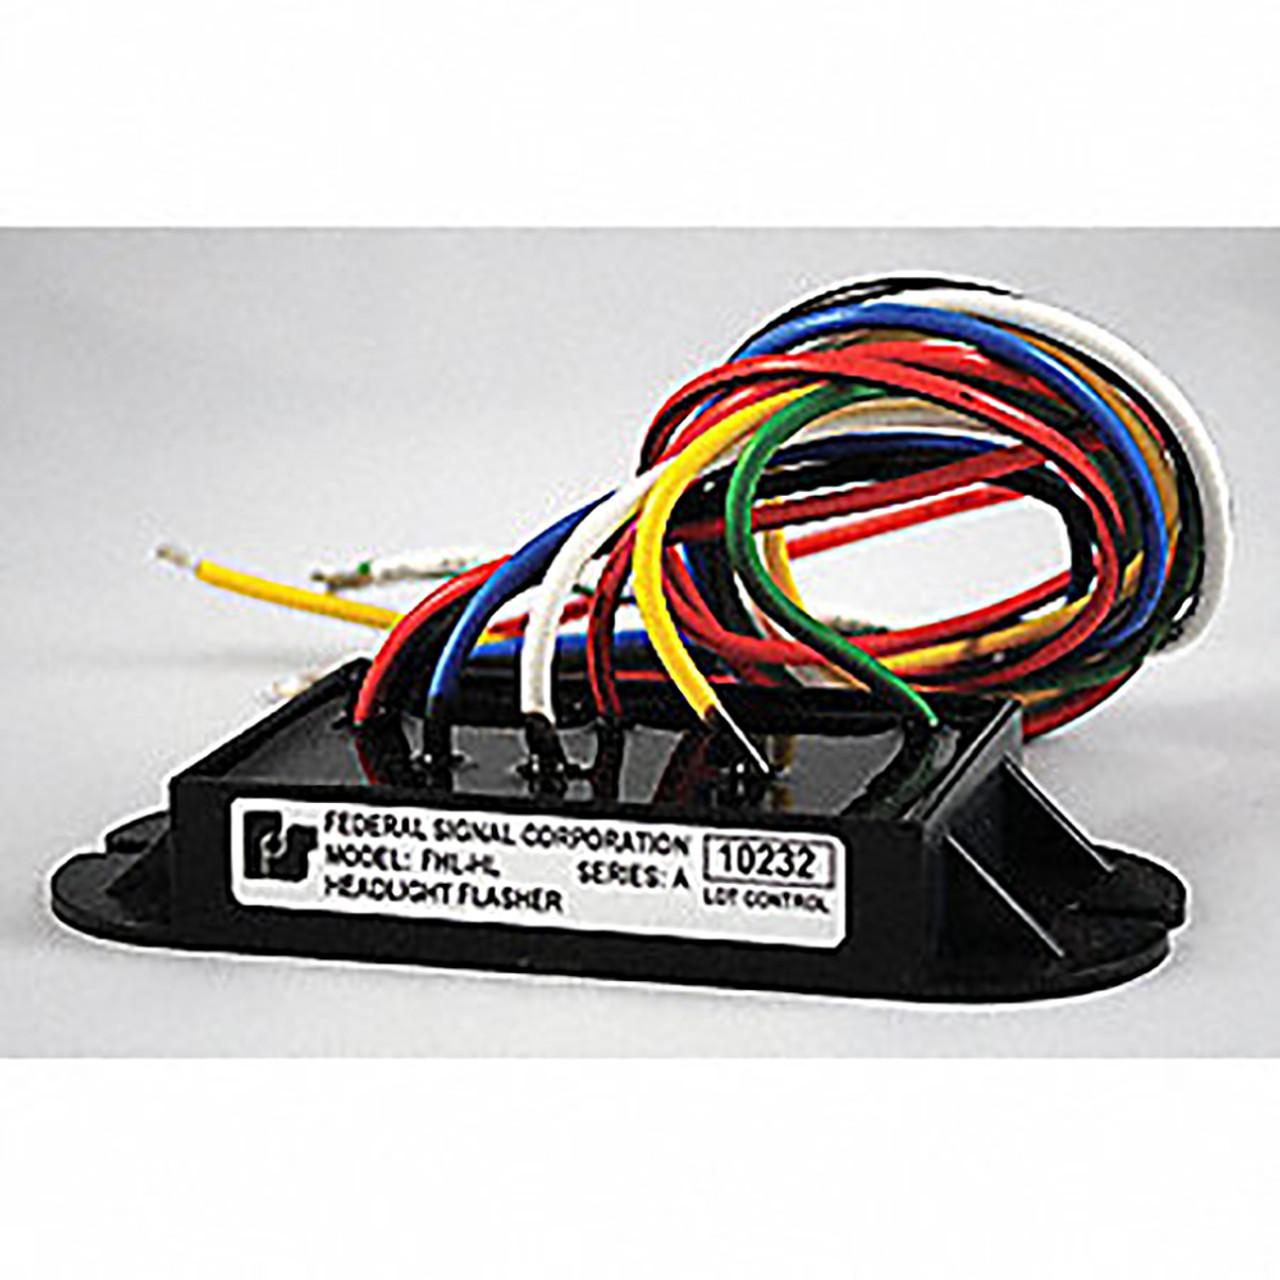 Federal Signal Headlight Flasher on